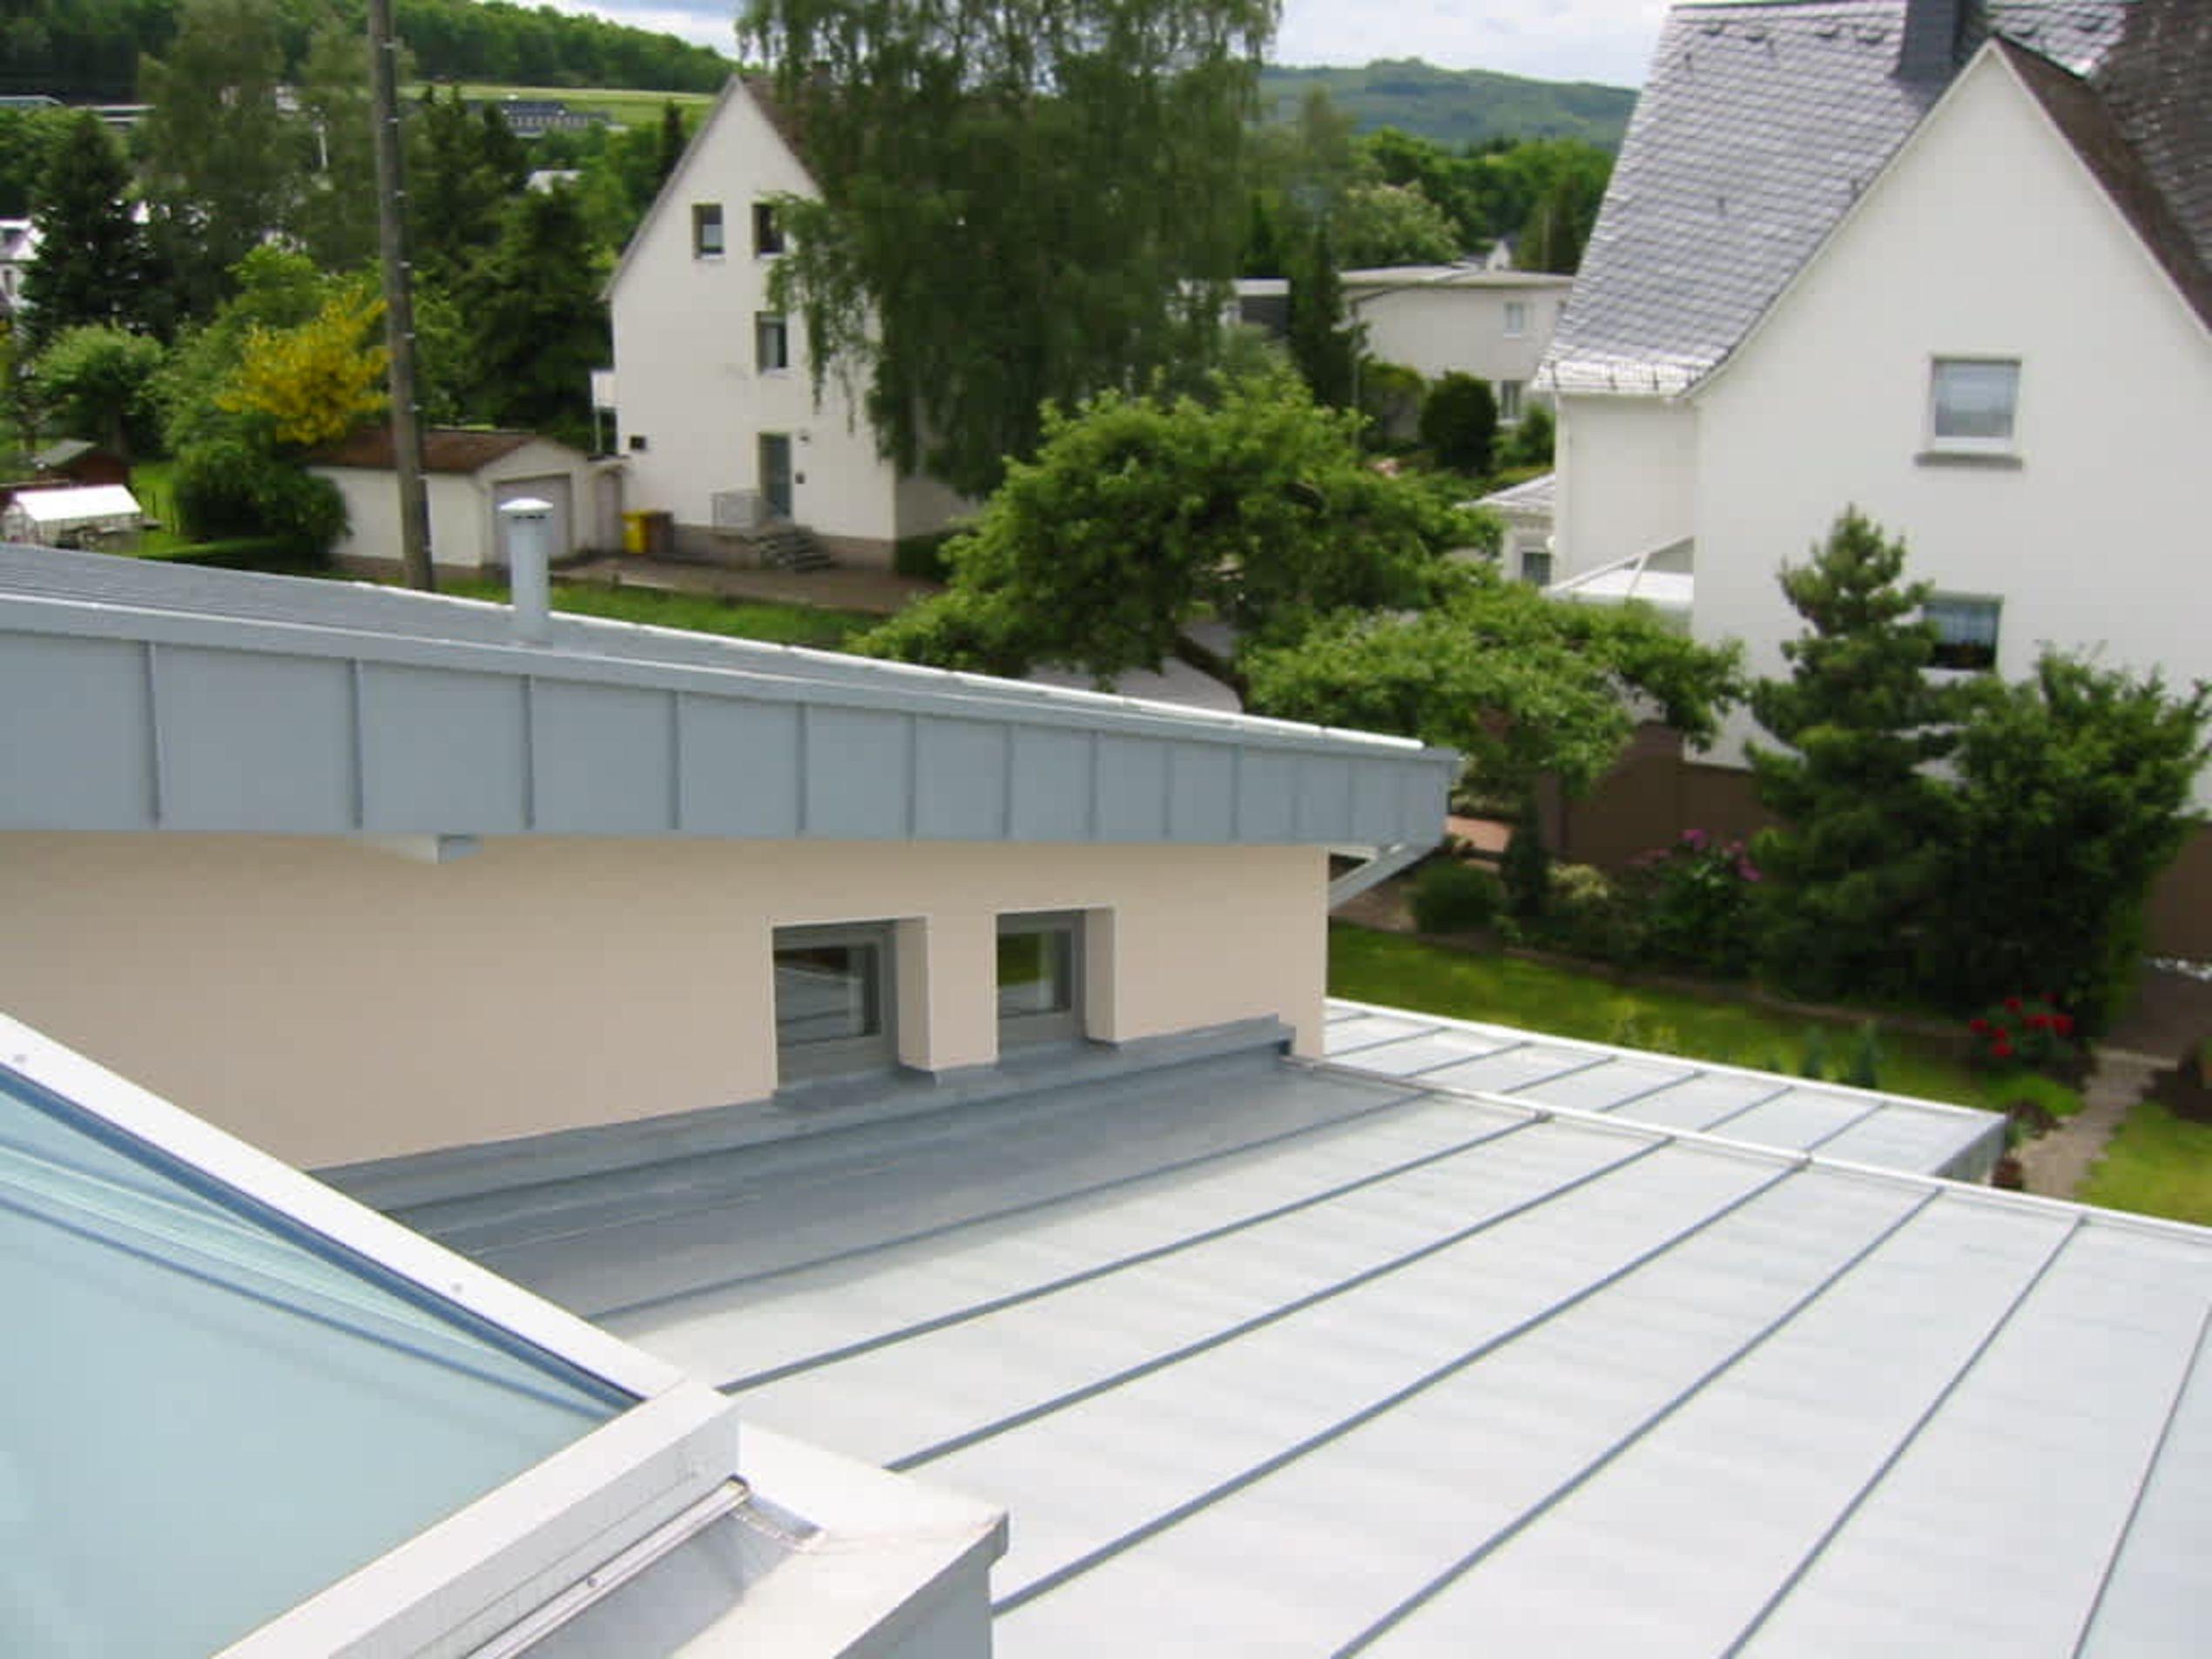 Klempnerarbeiten am Dach